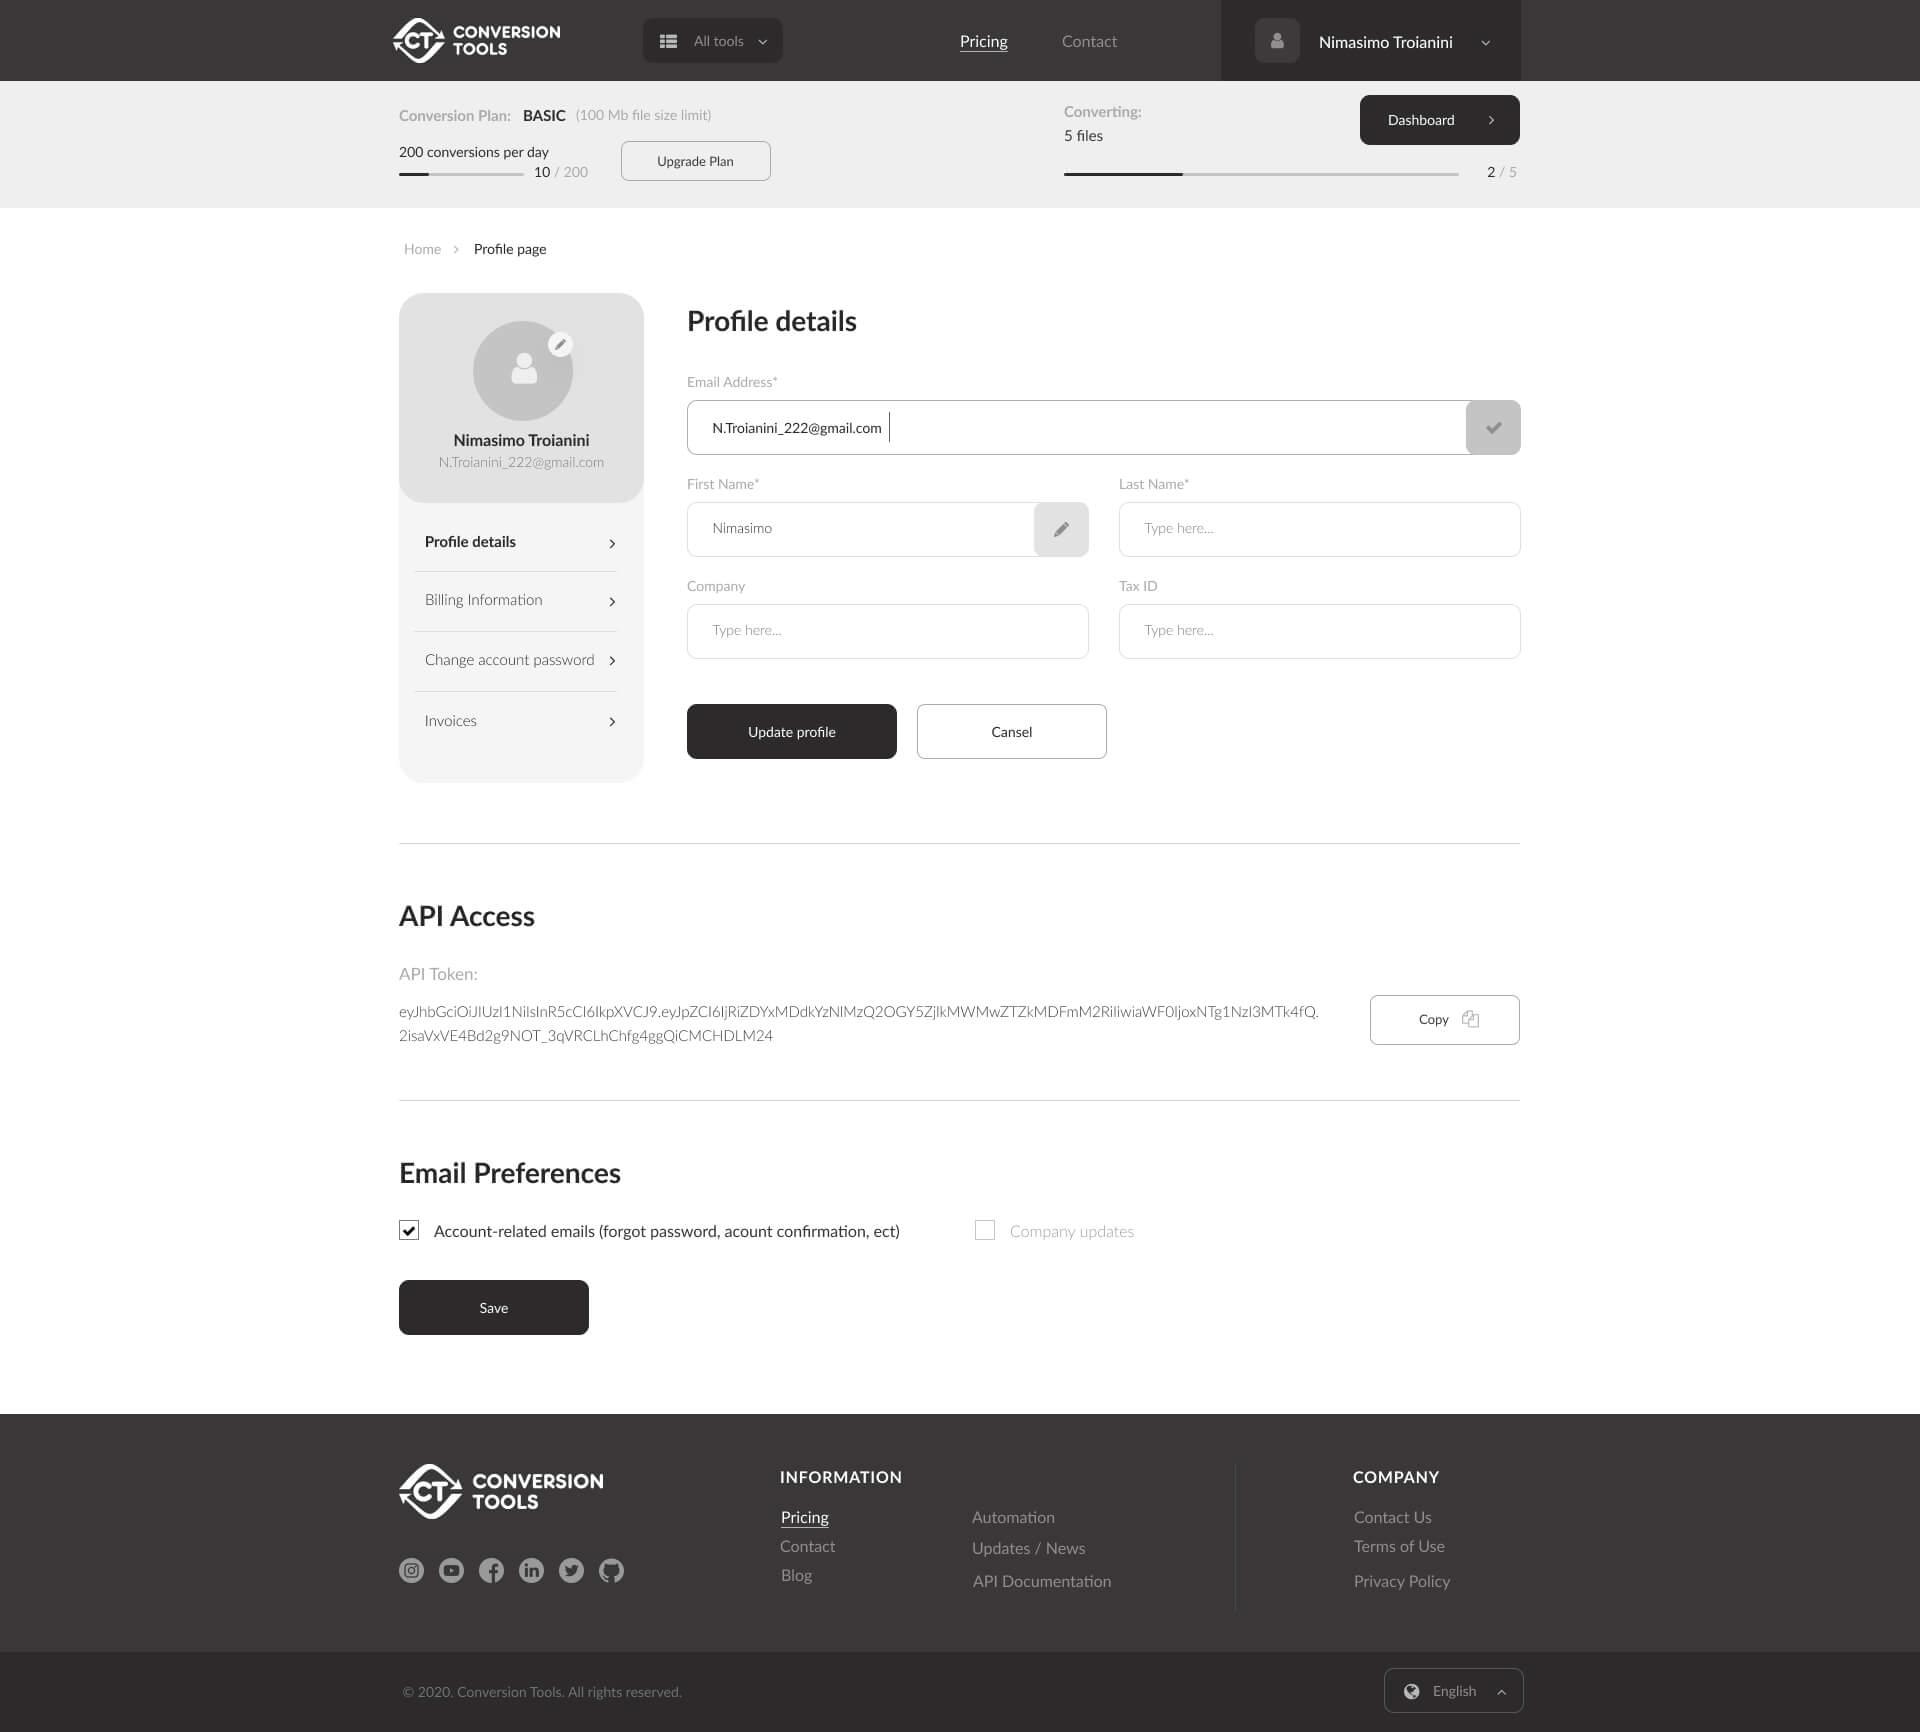 03_Сonversiontools.io_Wireframe_ Profile_Profile details_1.0-1